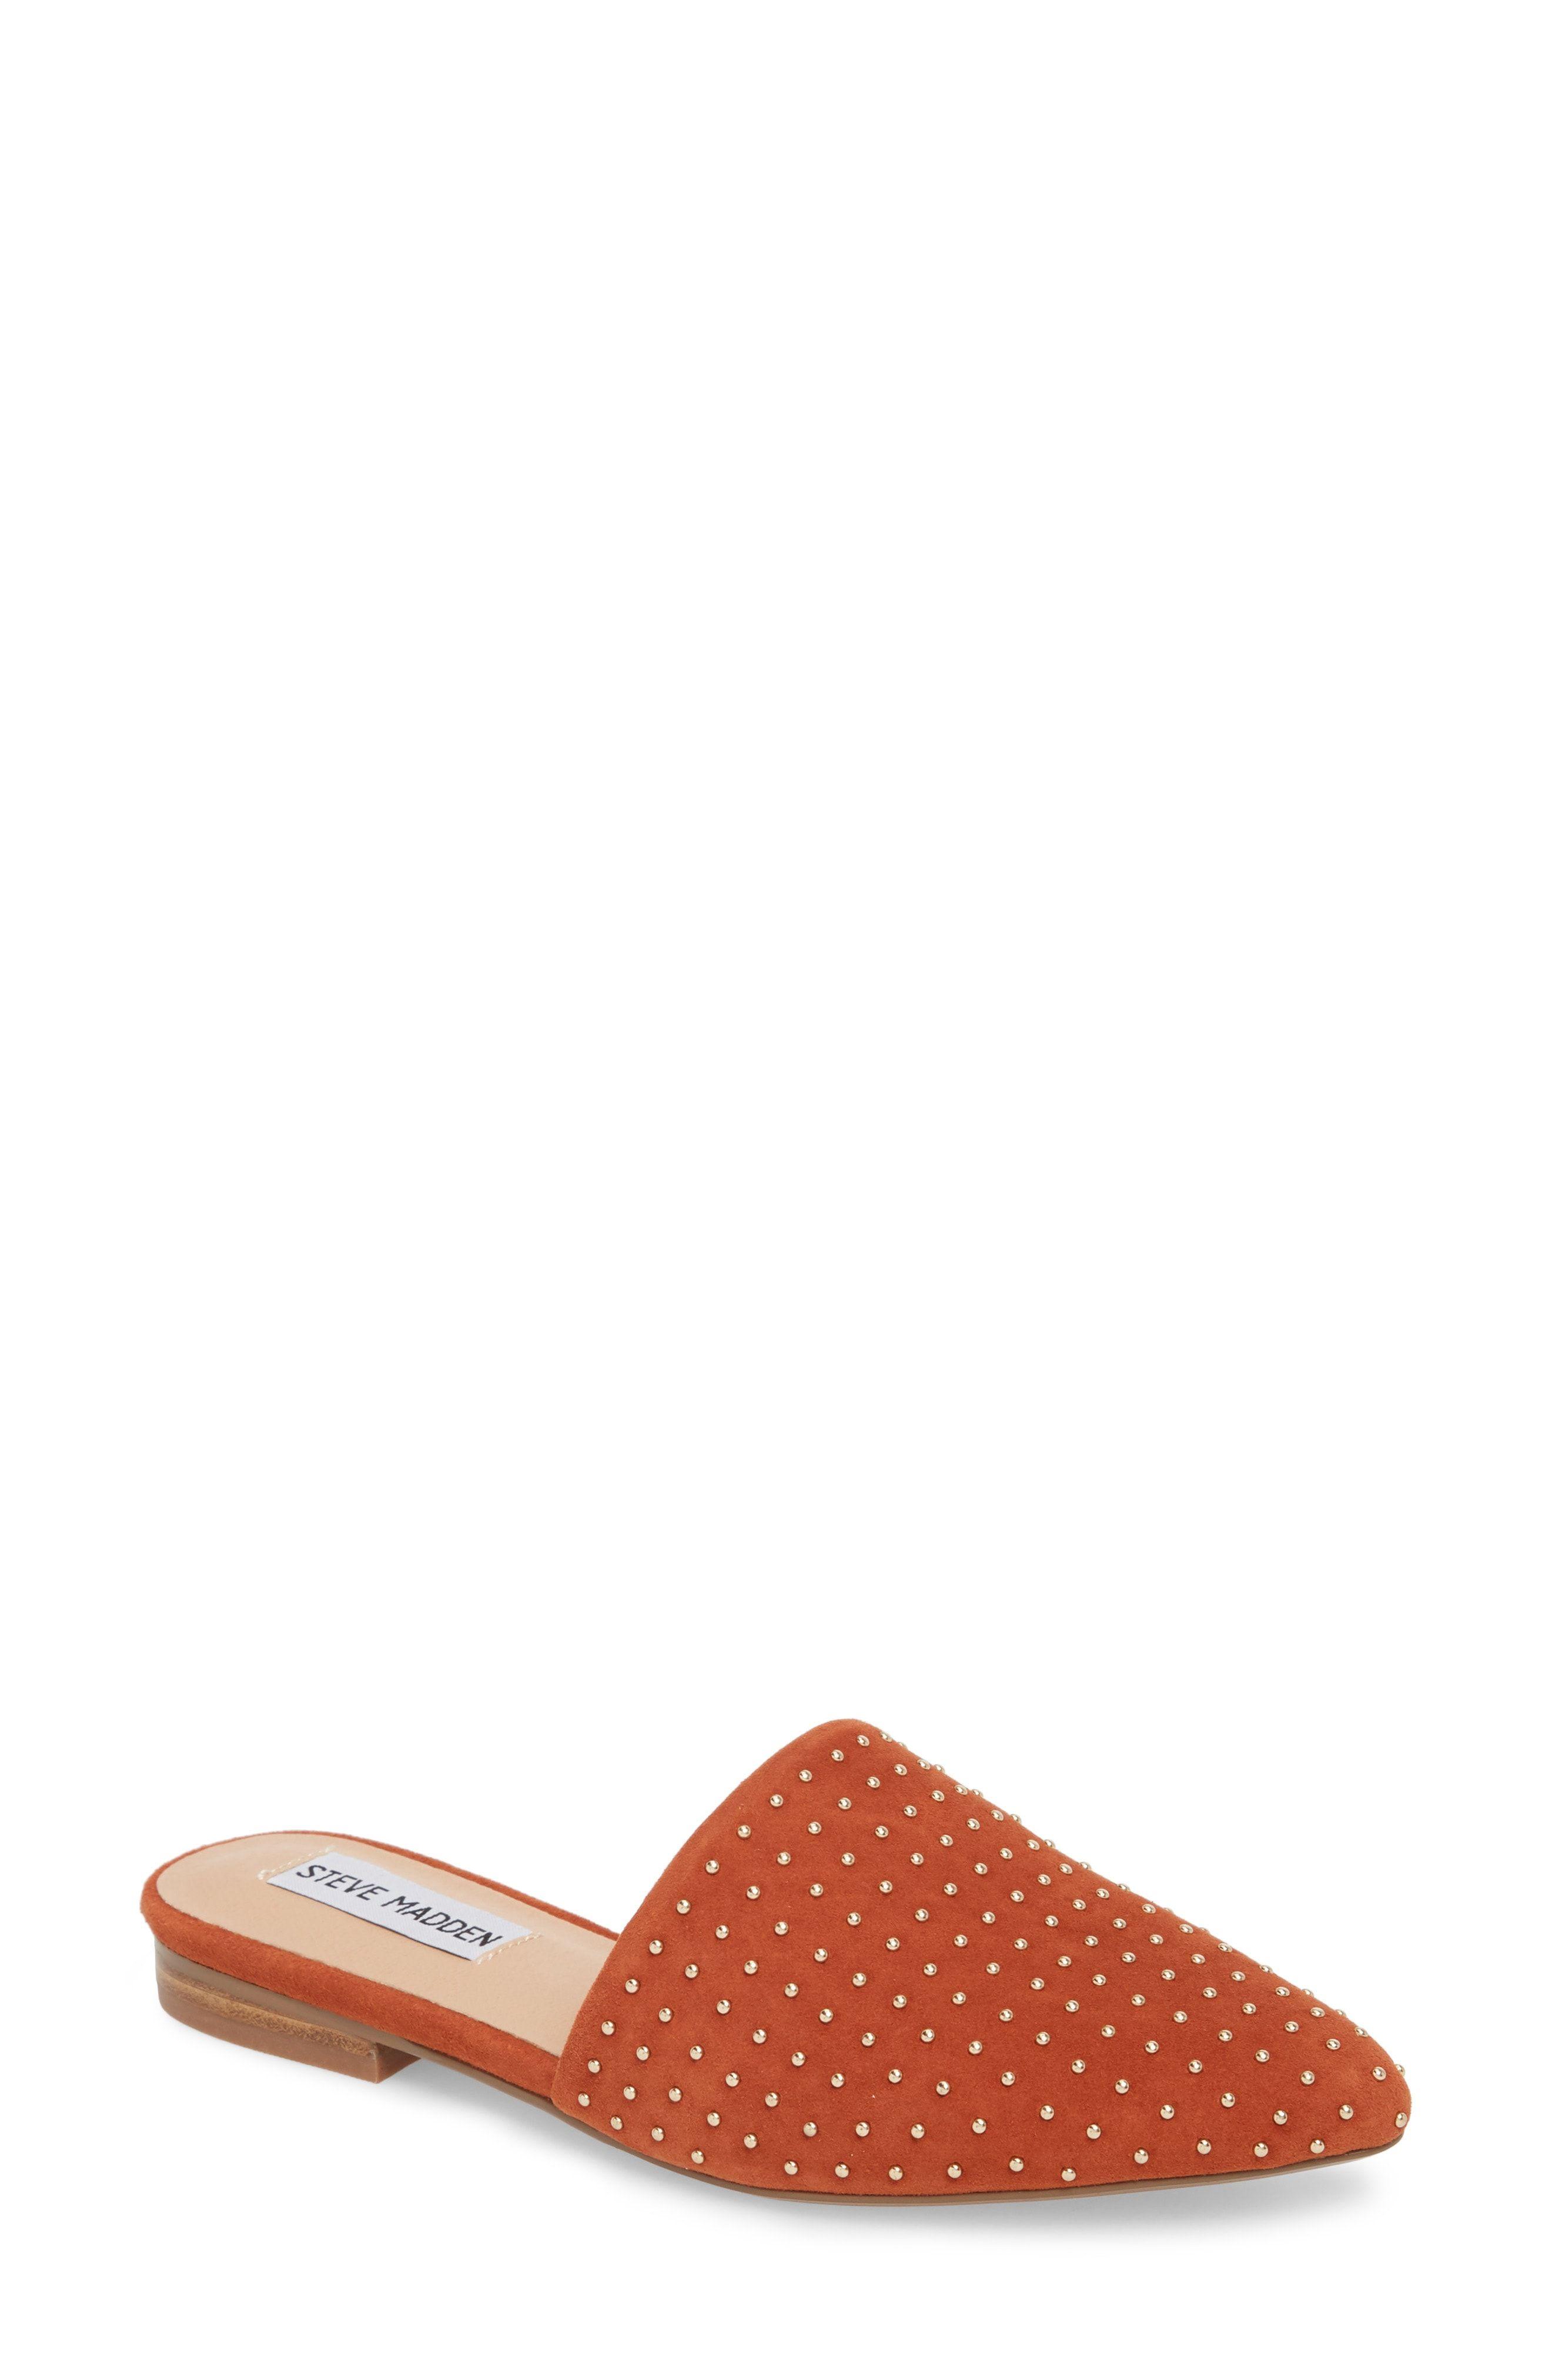 3f0b318379b Steve Madden Trace Studded Mule (Women)   Shoes   Pinterest